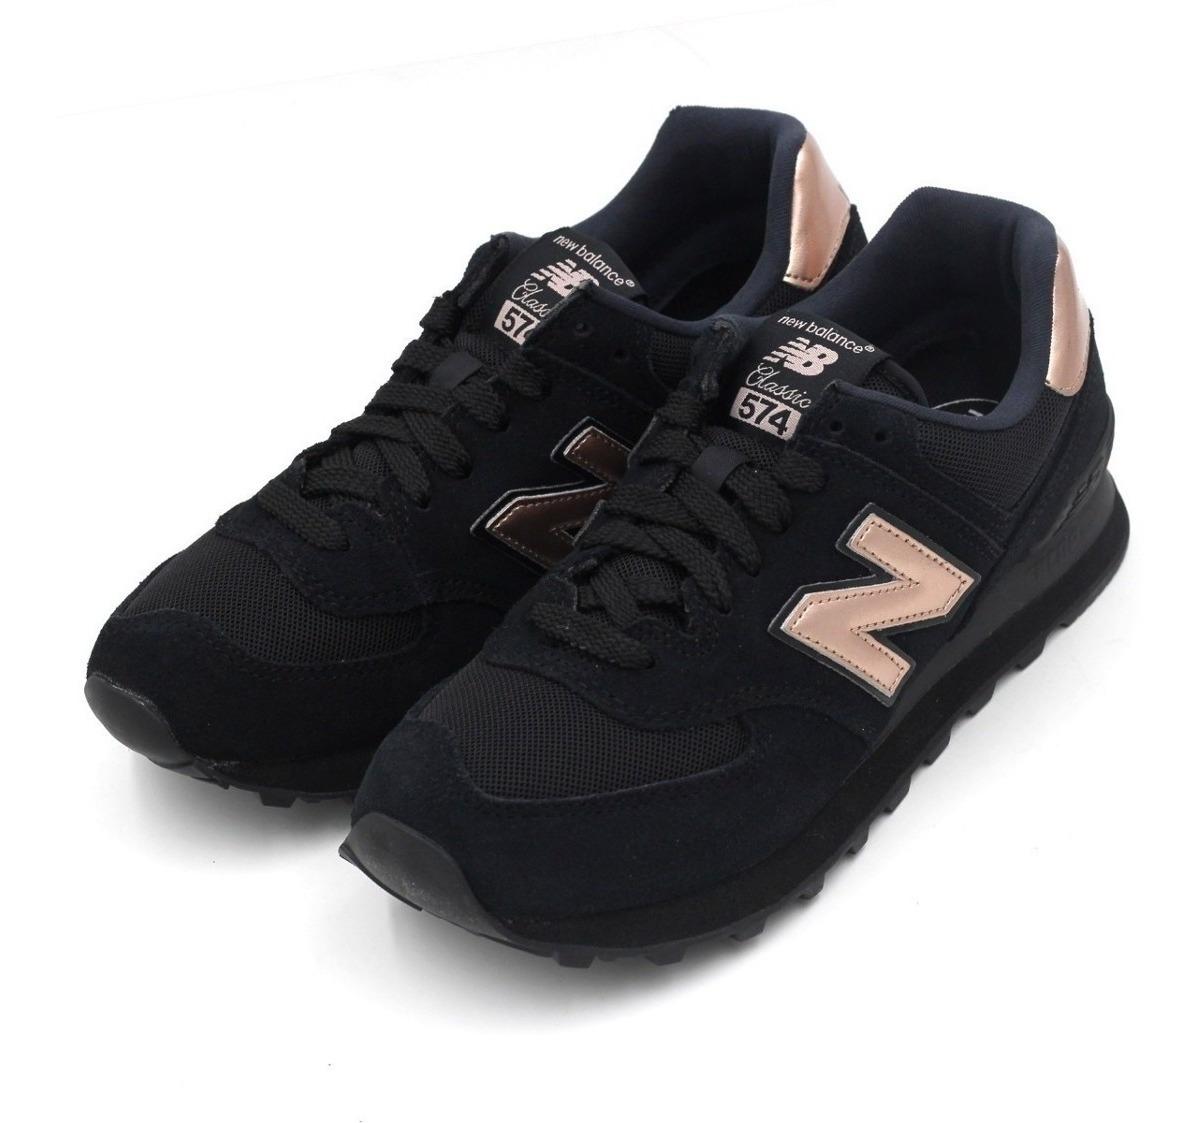 Zapatillas New Balance Negra Ocre Para Mujer Gran Oferta